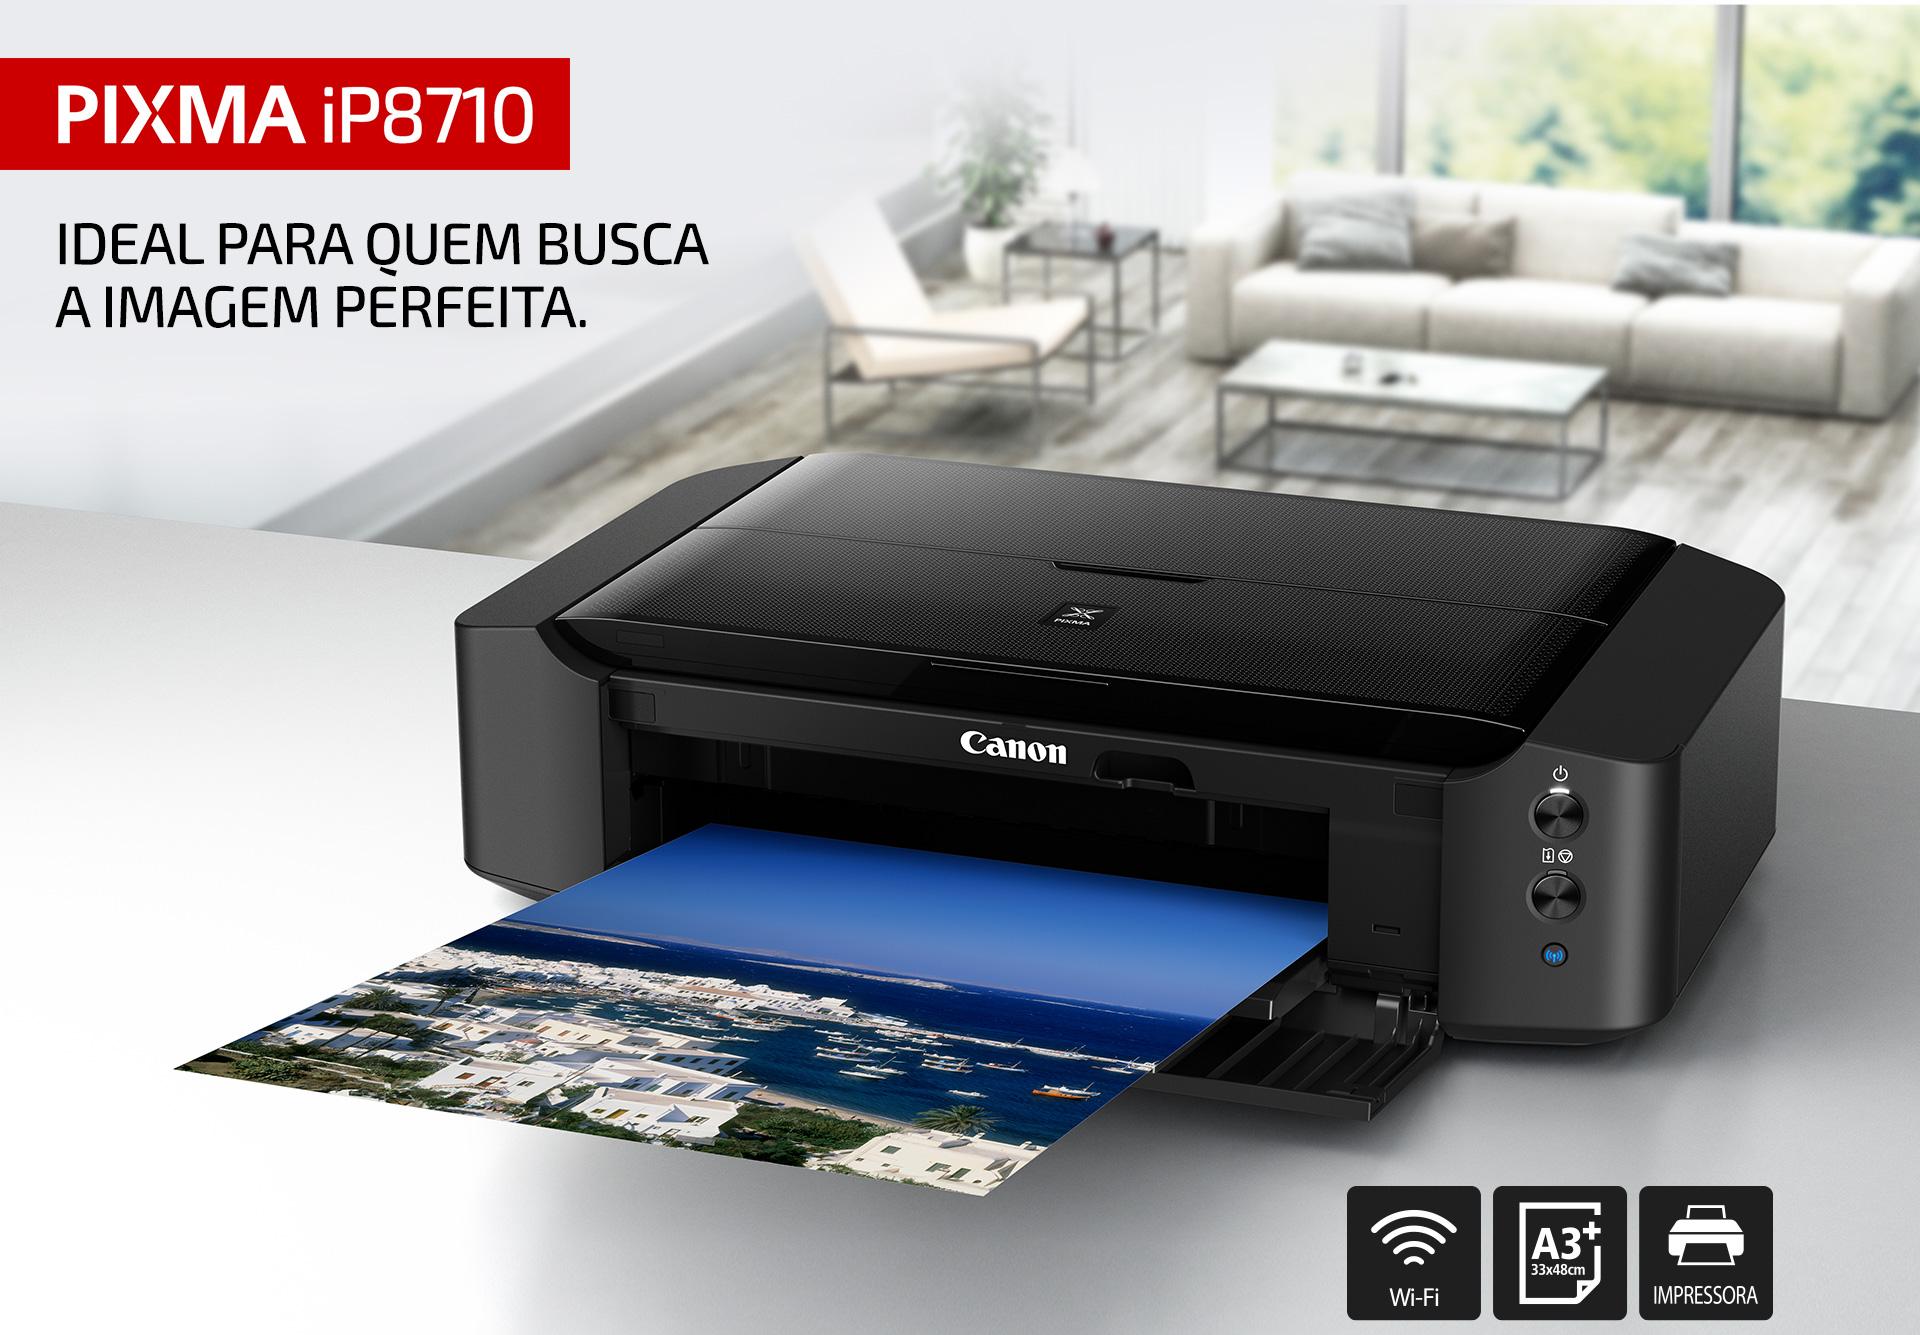 Impressora Fotográfica Jato de Tinta PIXMA iP8710